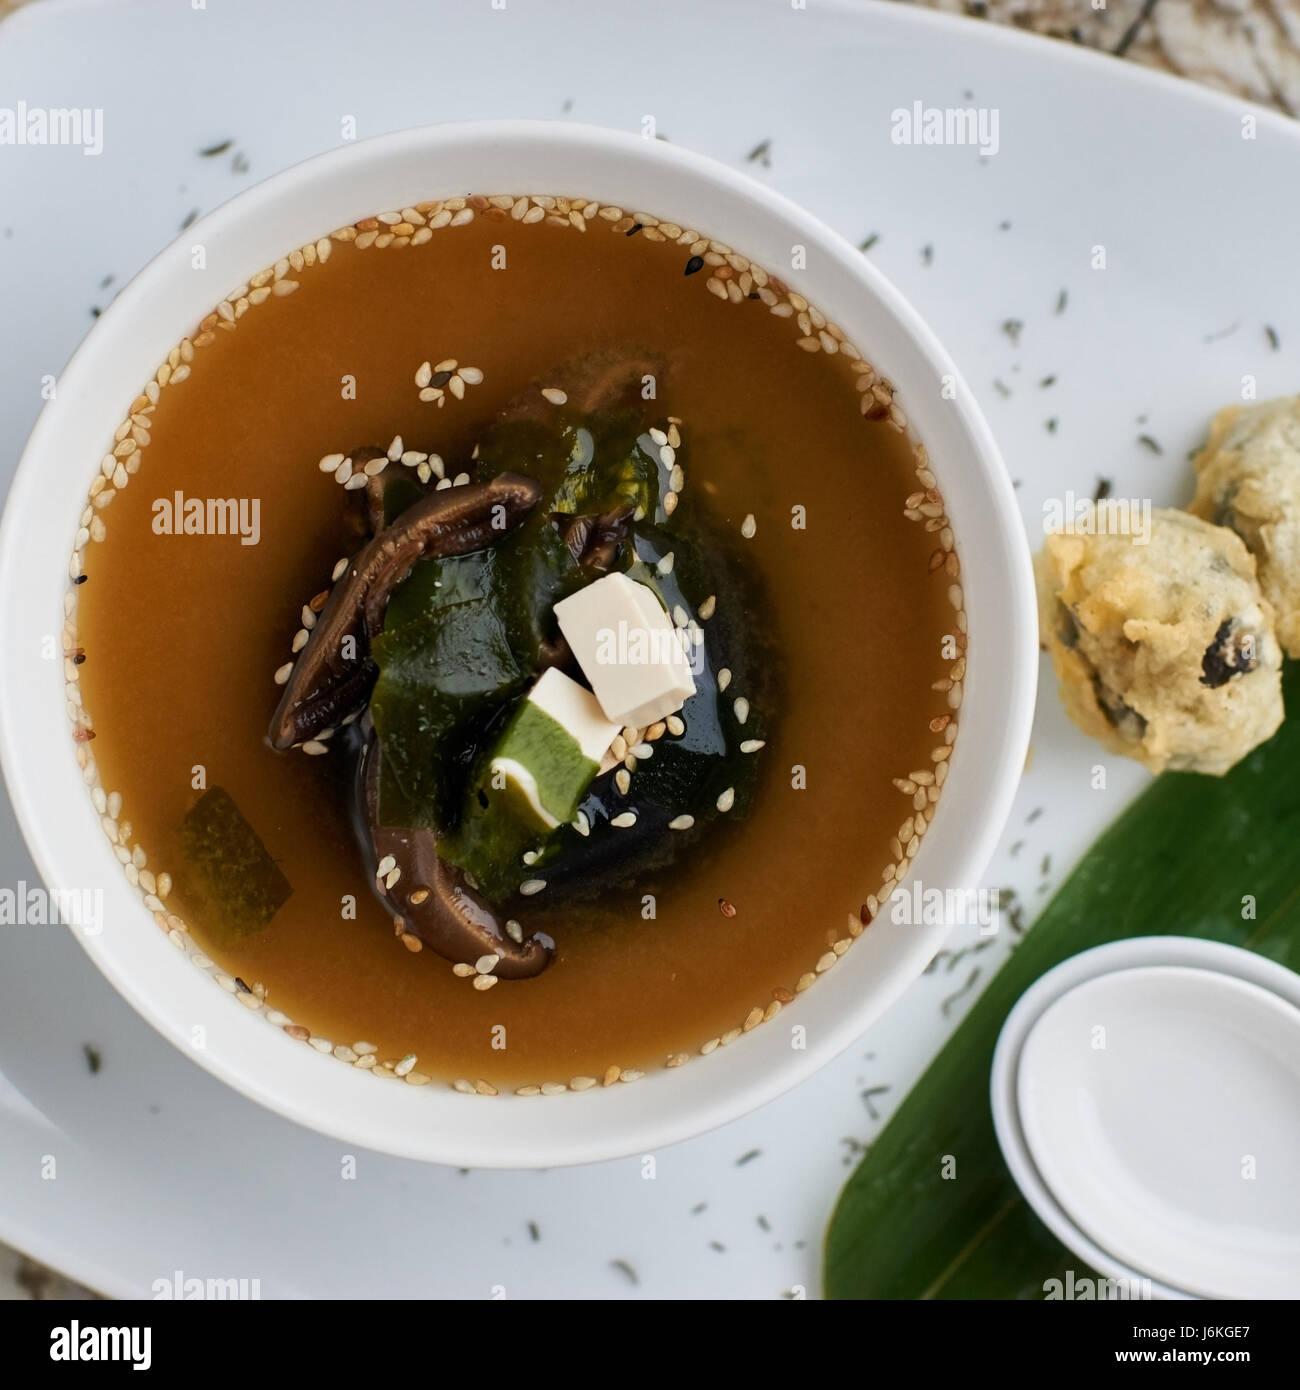 Miso soup with shiitake mushrooms - Stock Image